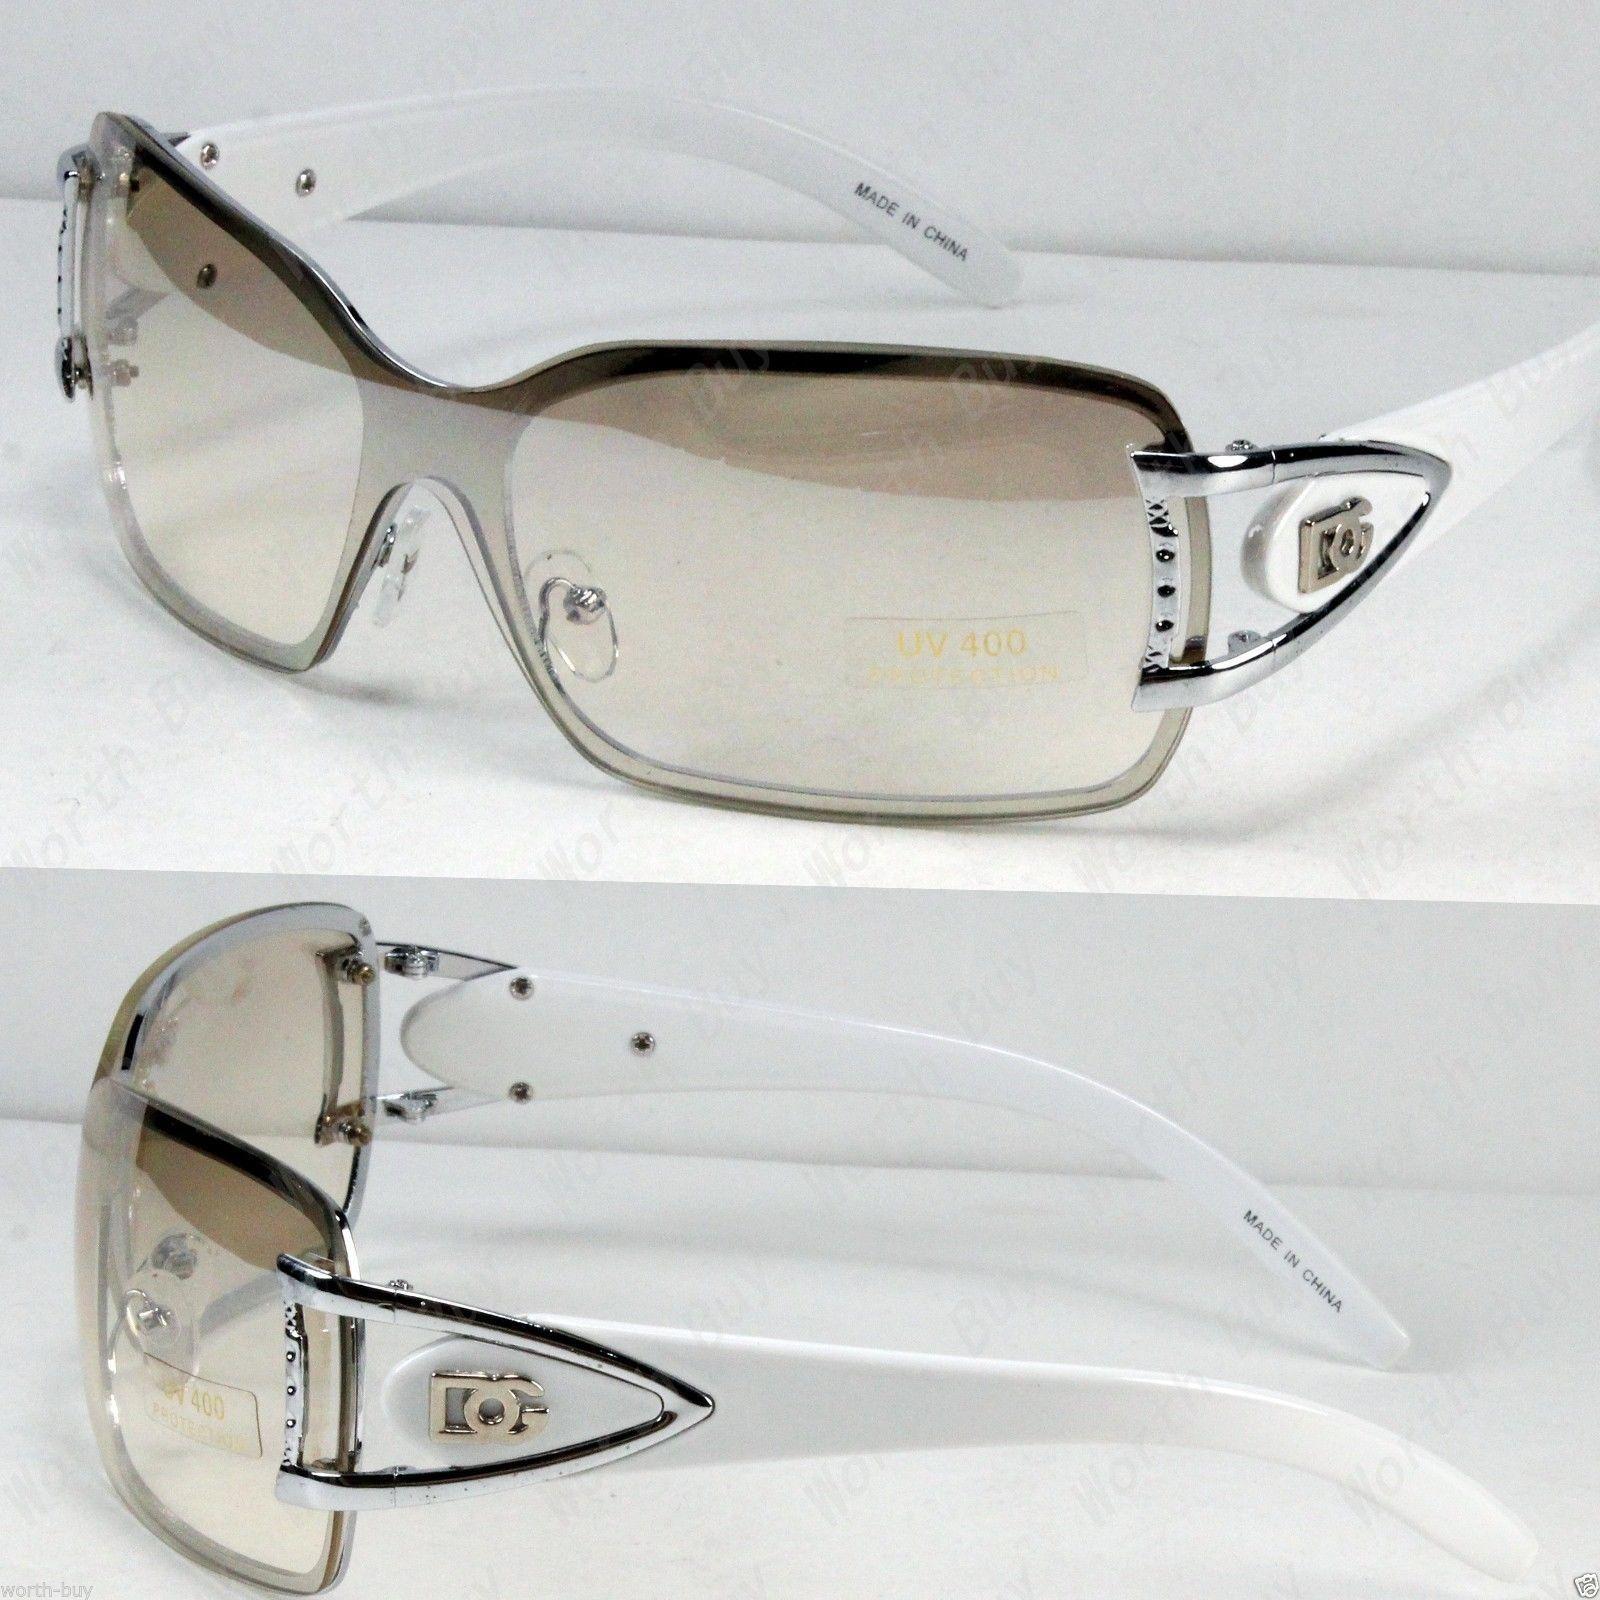 e9591cfc8ea New DG Womens Rimless Sunglasses Shades Fashion Designer White Shield One  Lens Price   4.45 Ends on   Related Posts DG Eyewear Shield Womens Designer  ...